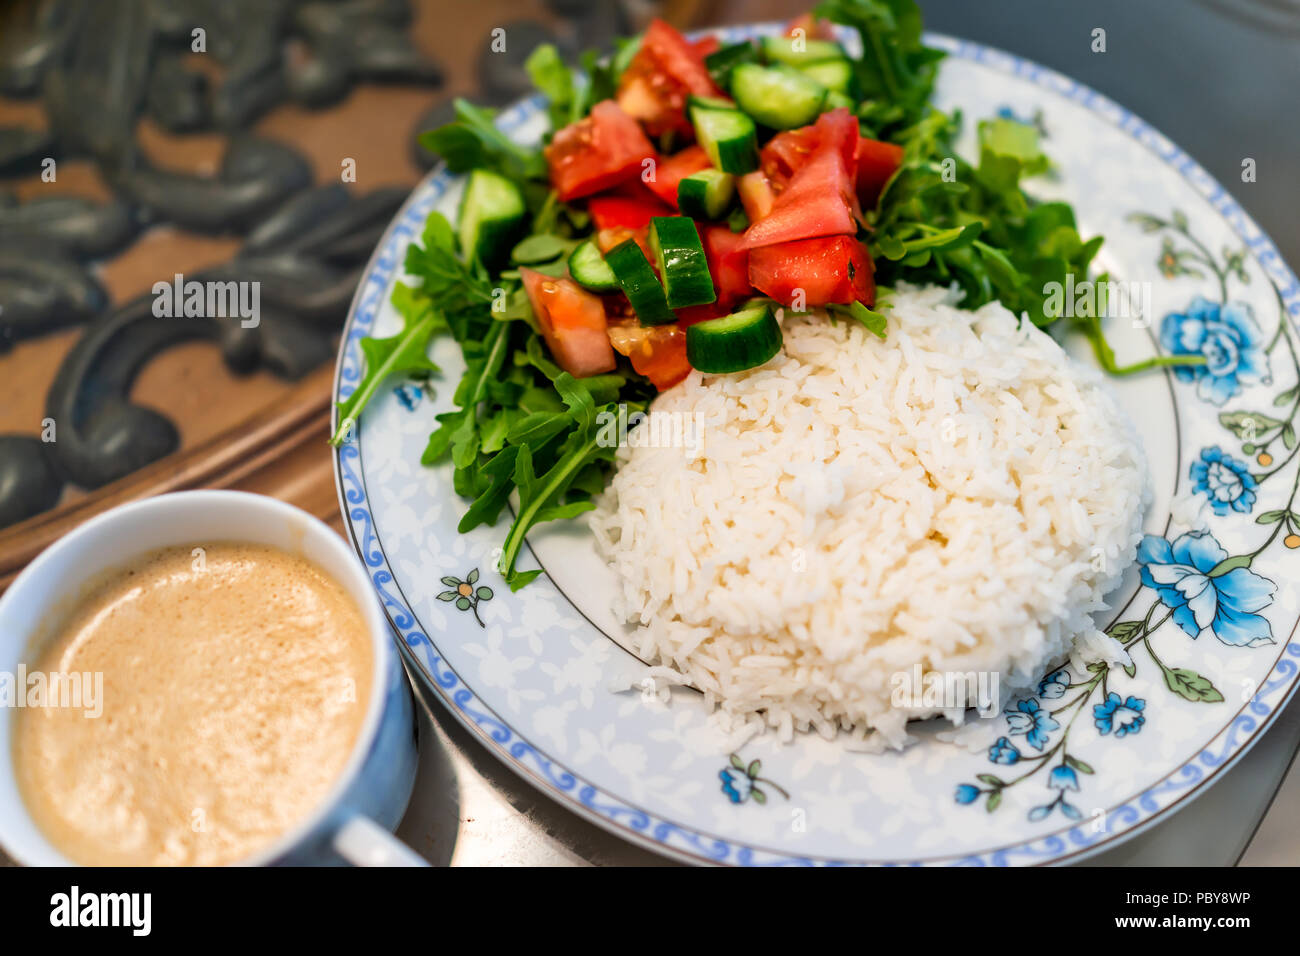 vegan diet white rice